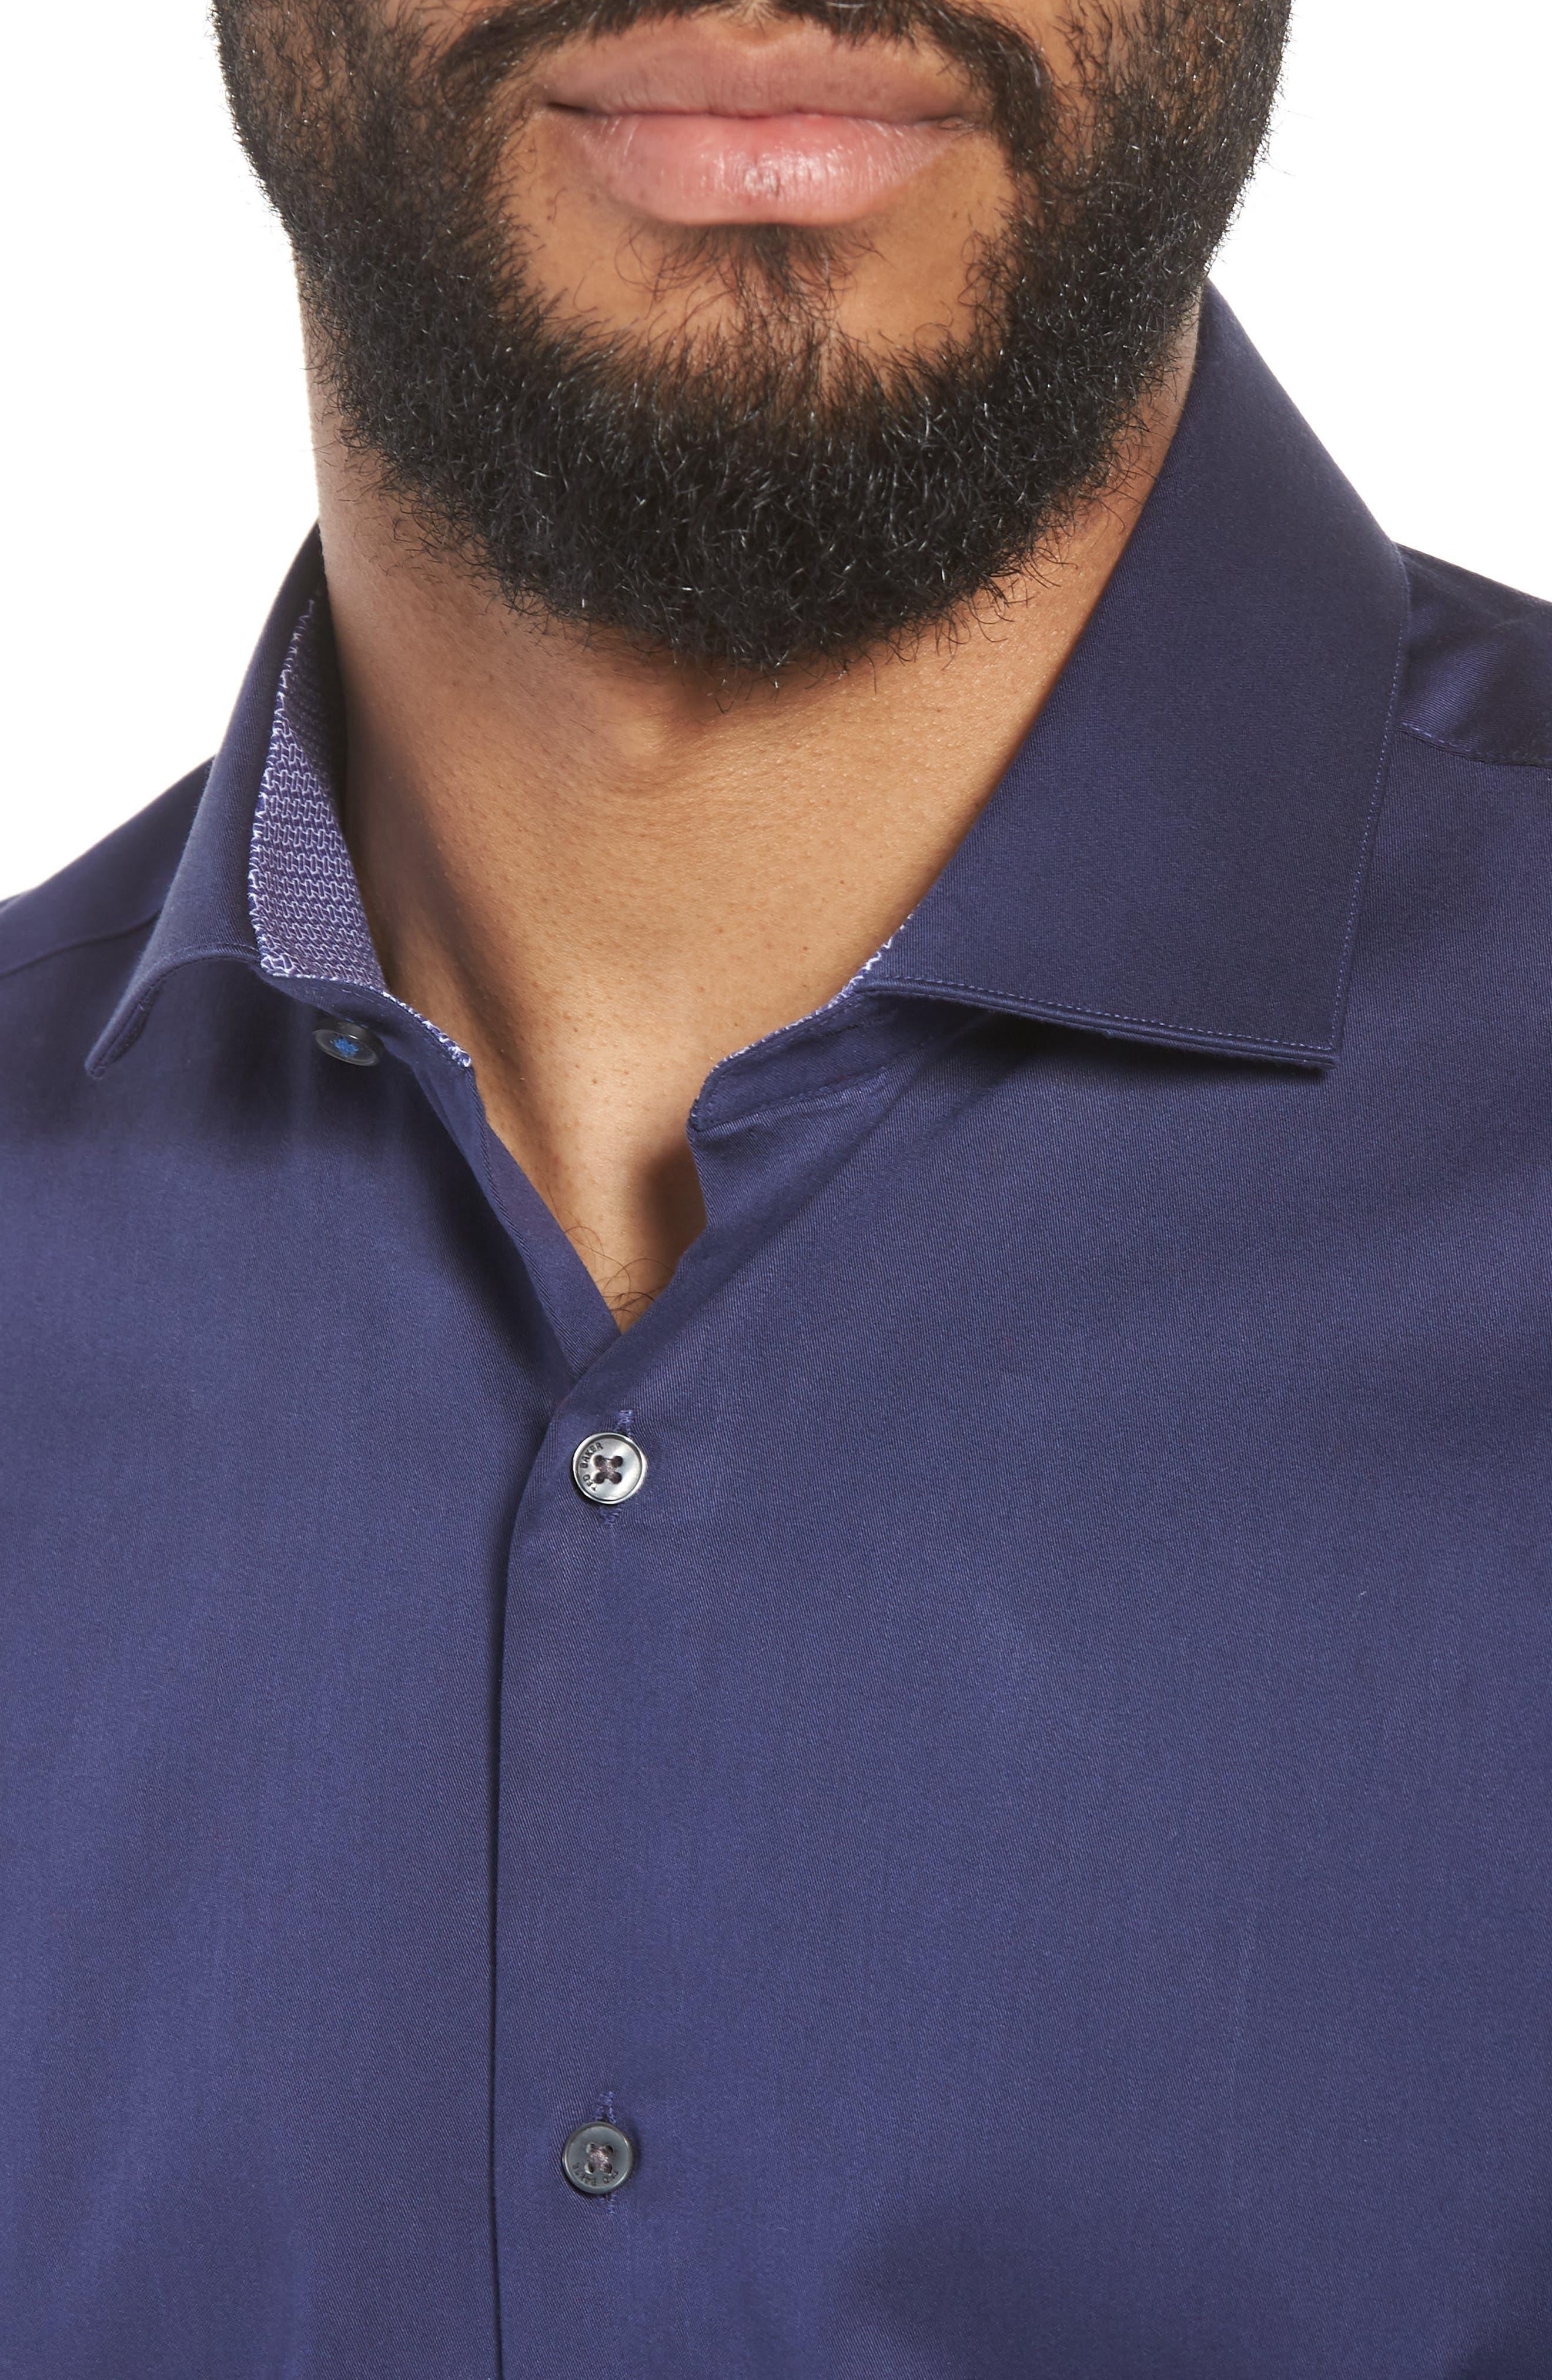 Endurance Bookers Slim Fit Solid Dress Shirt,                             Alternate thumbnail 2, color,                             Navy